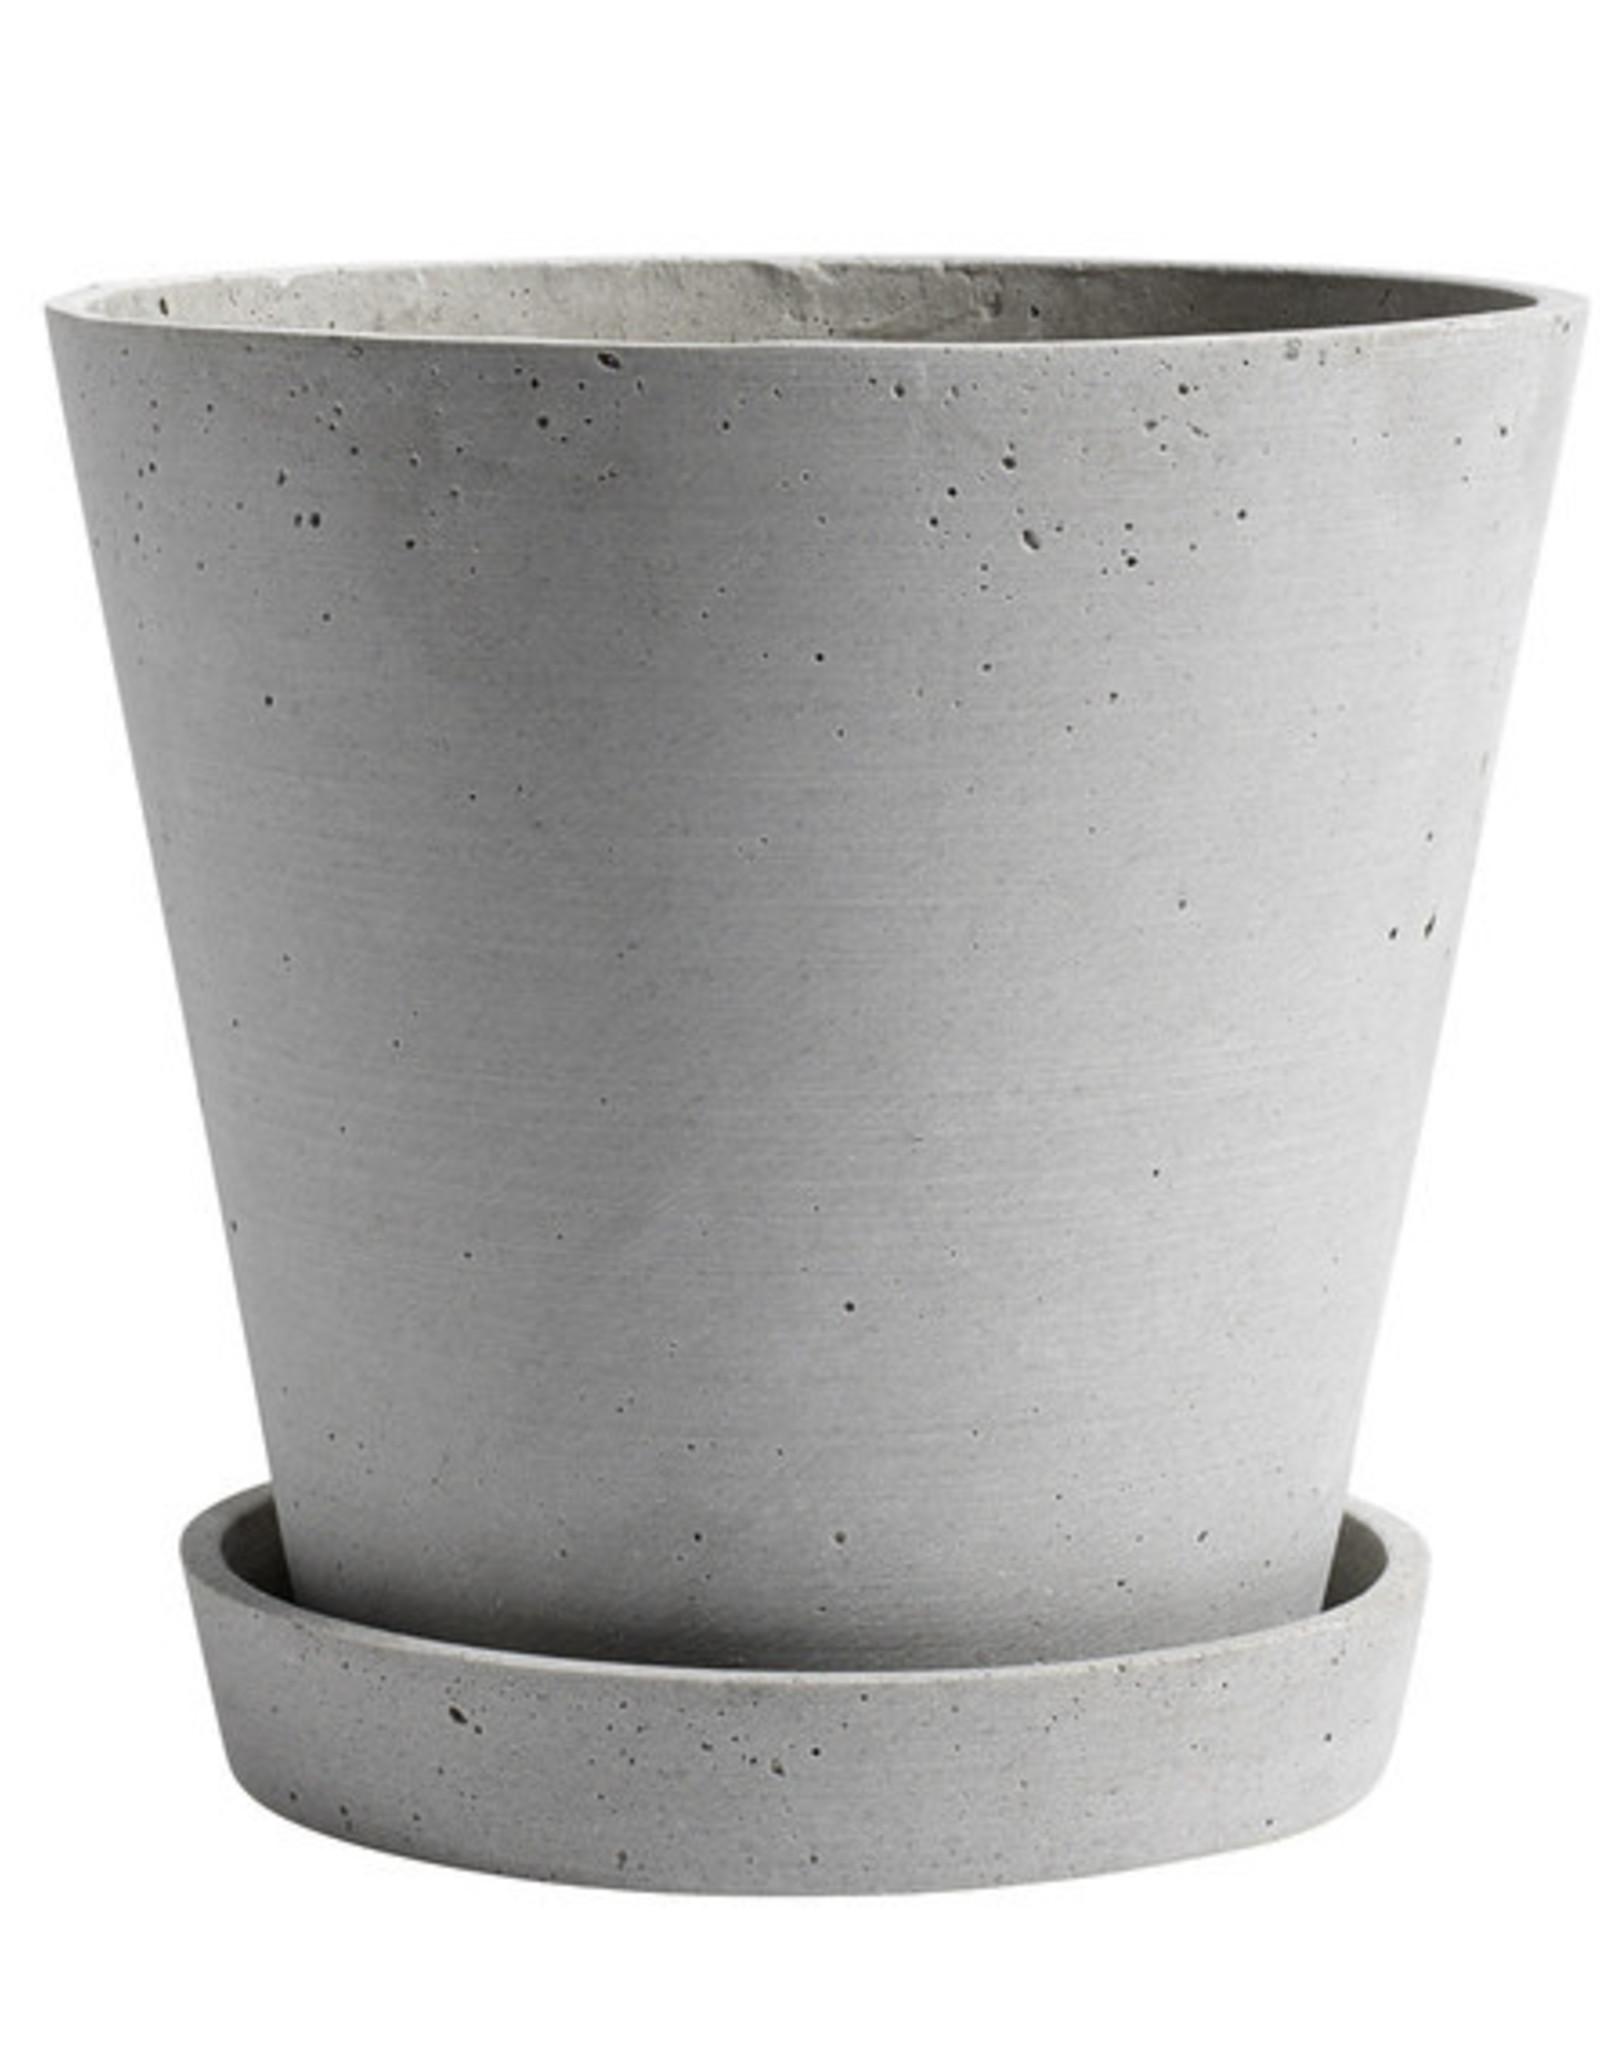 HAY HAY Flowerpot with Saucer XL Grey